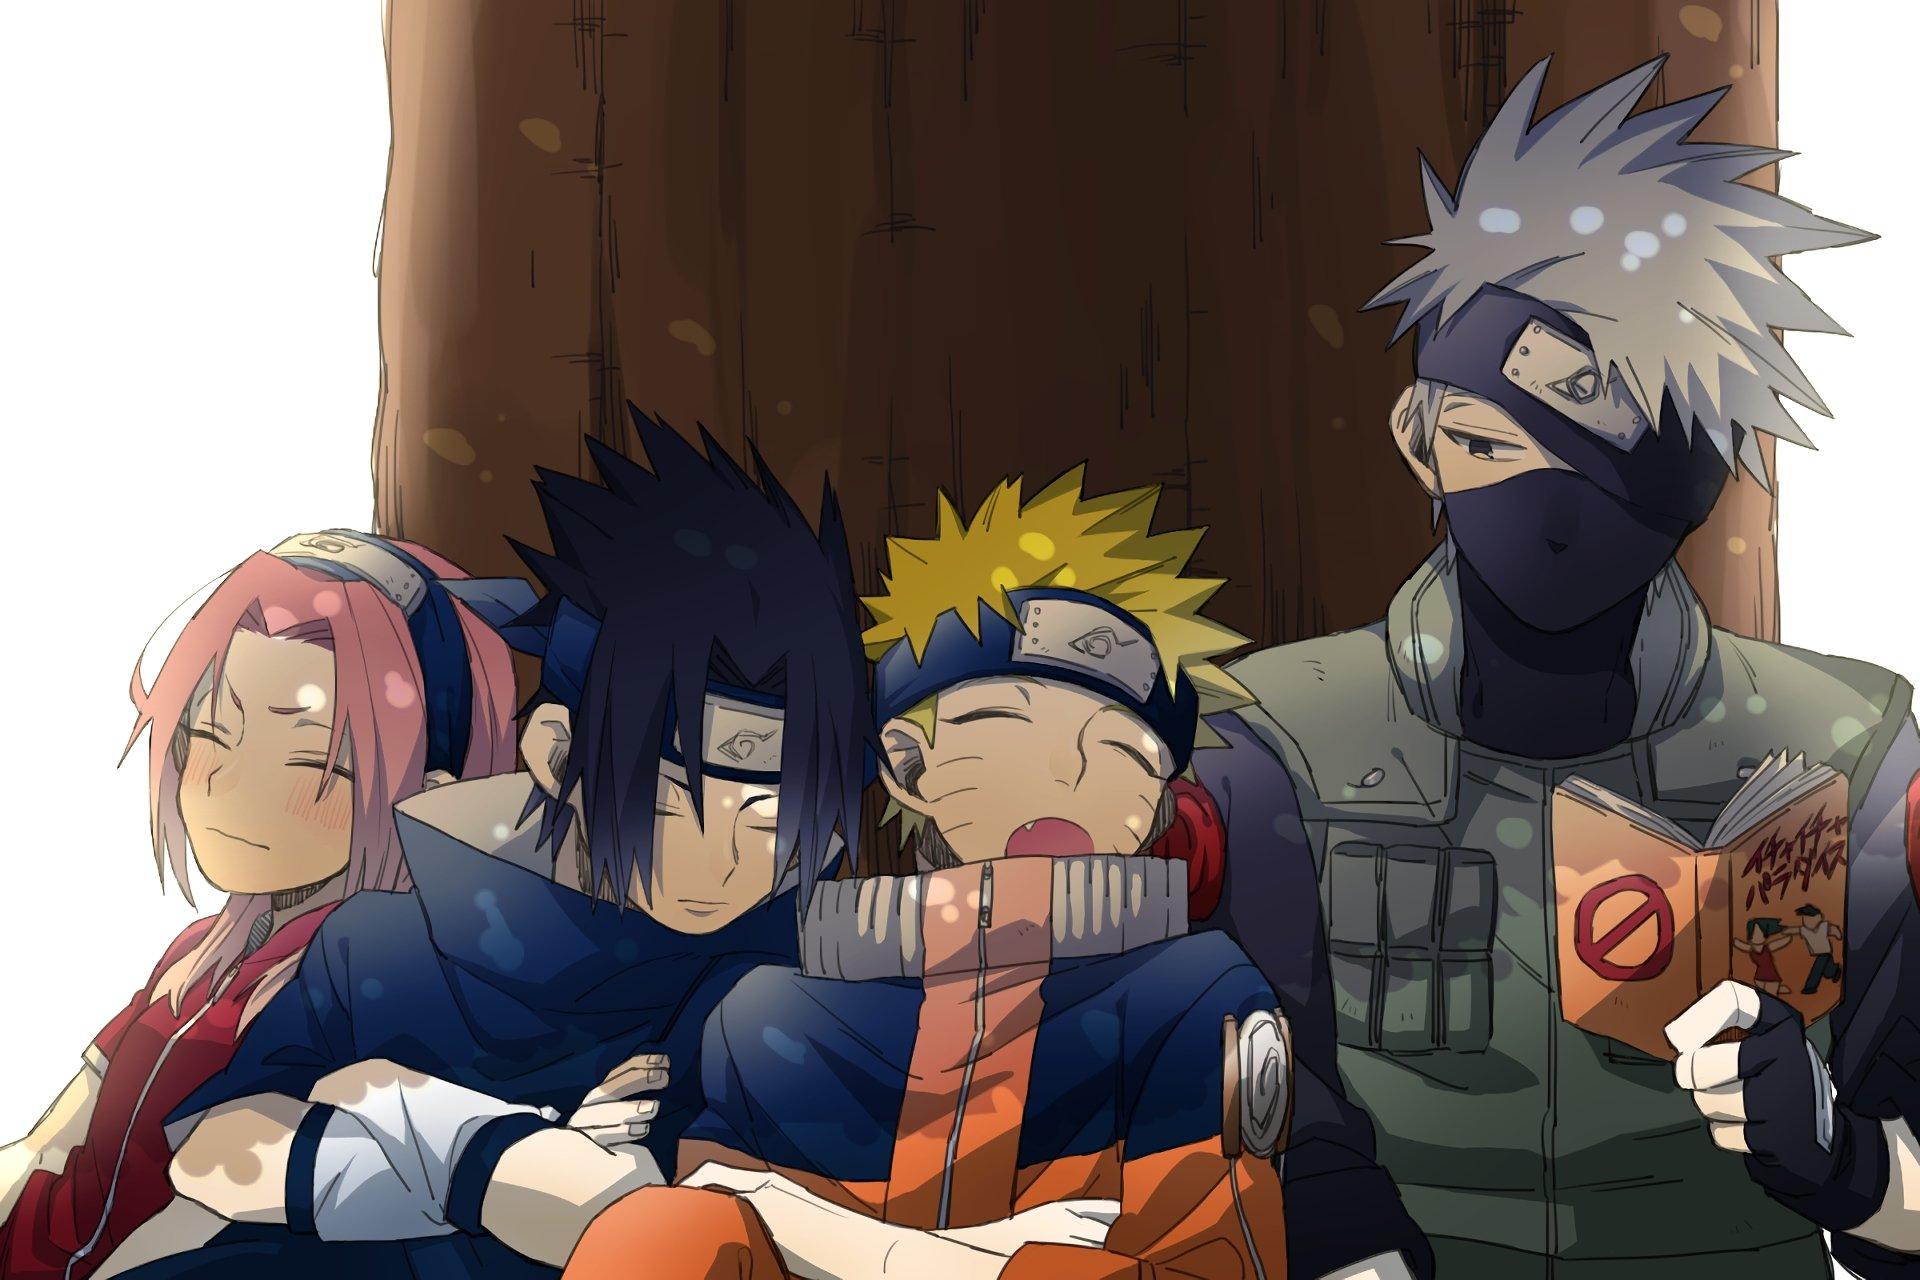 Fondos de pantalla Anime Personajes de Naruto